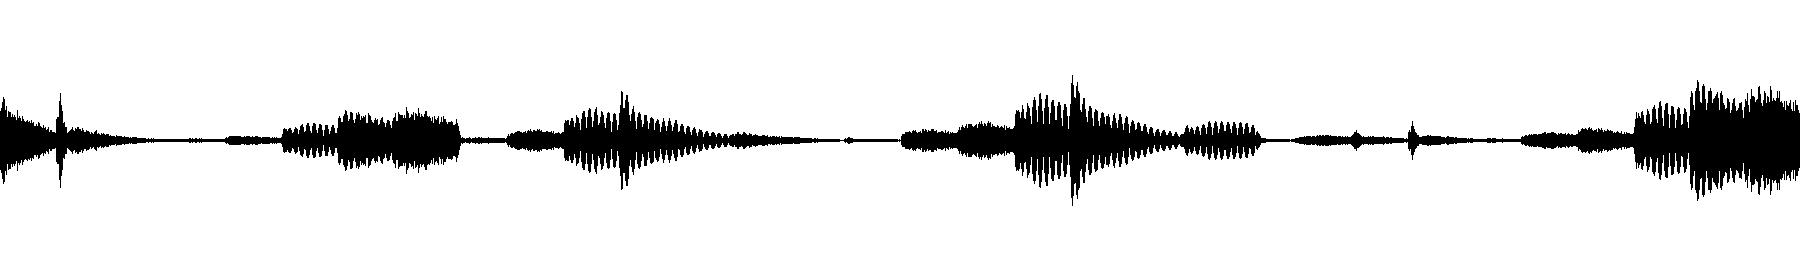 g abs05 065